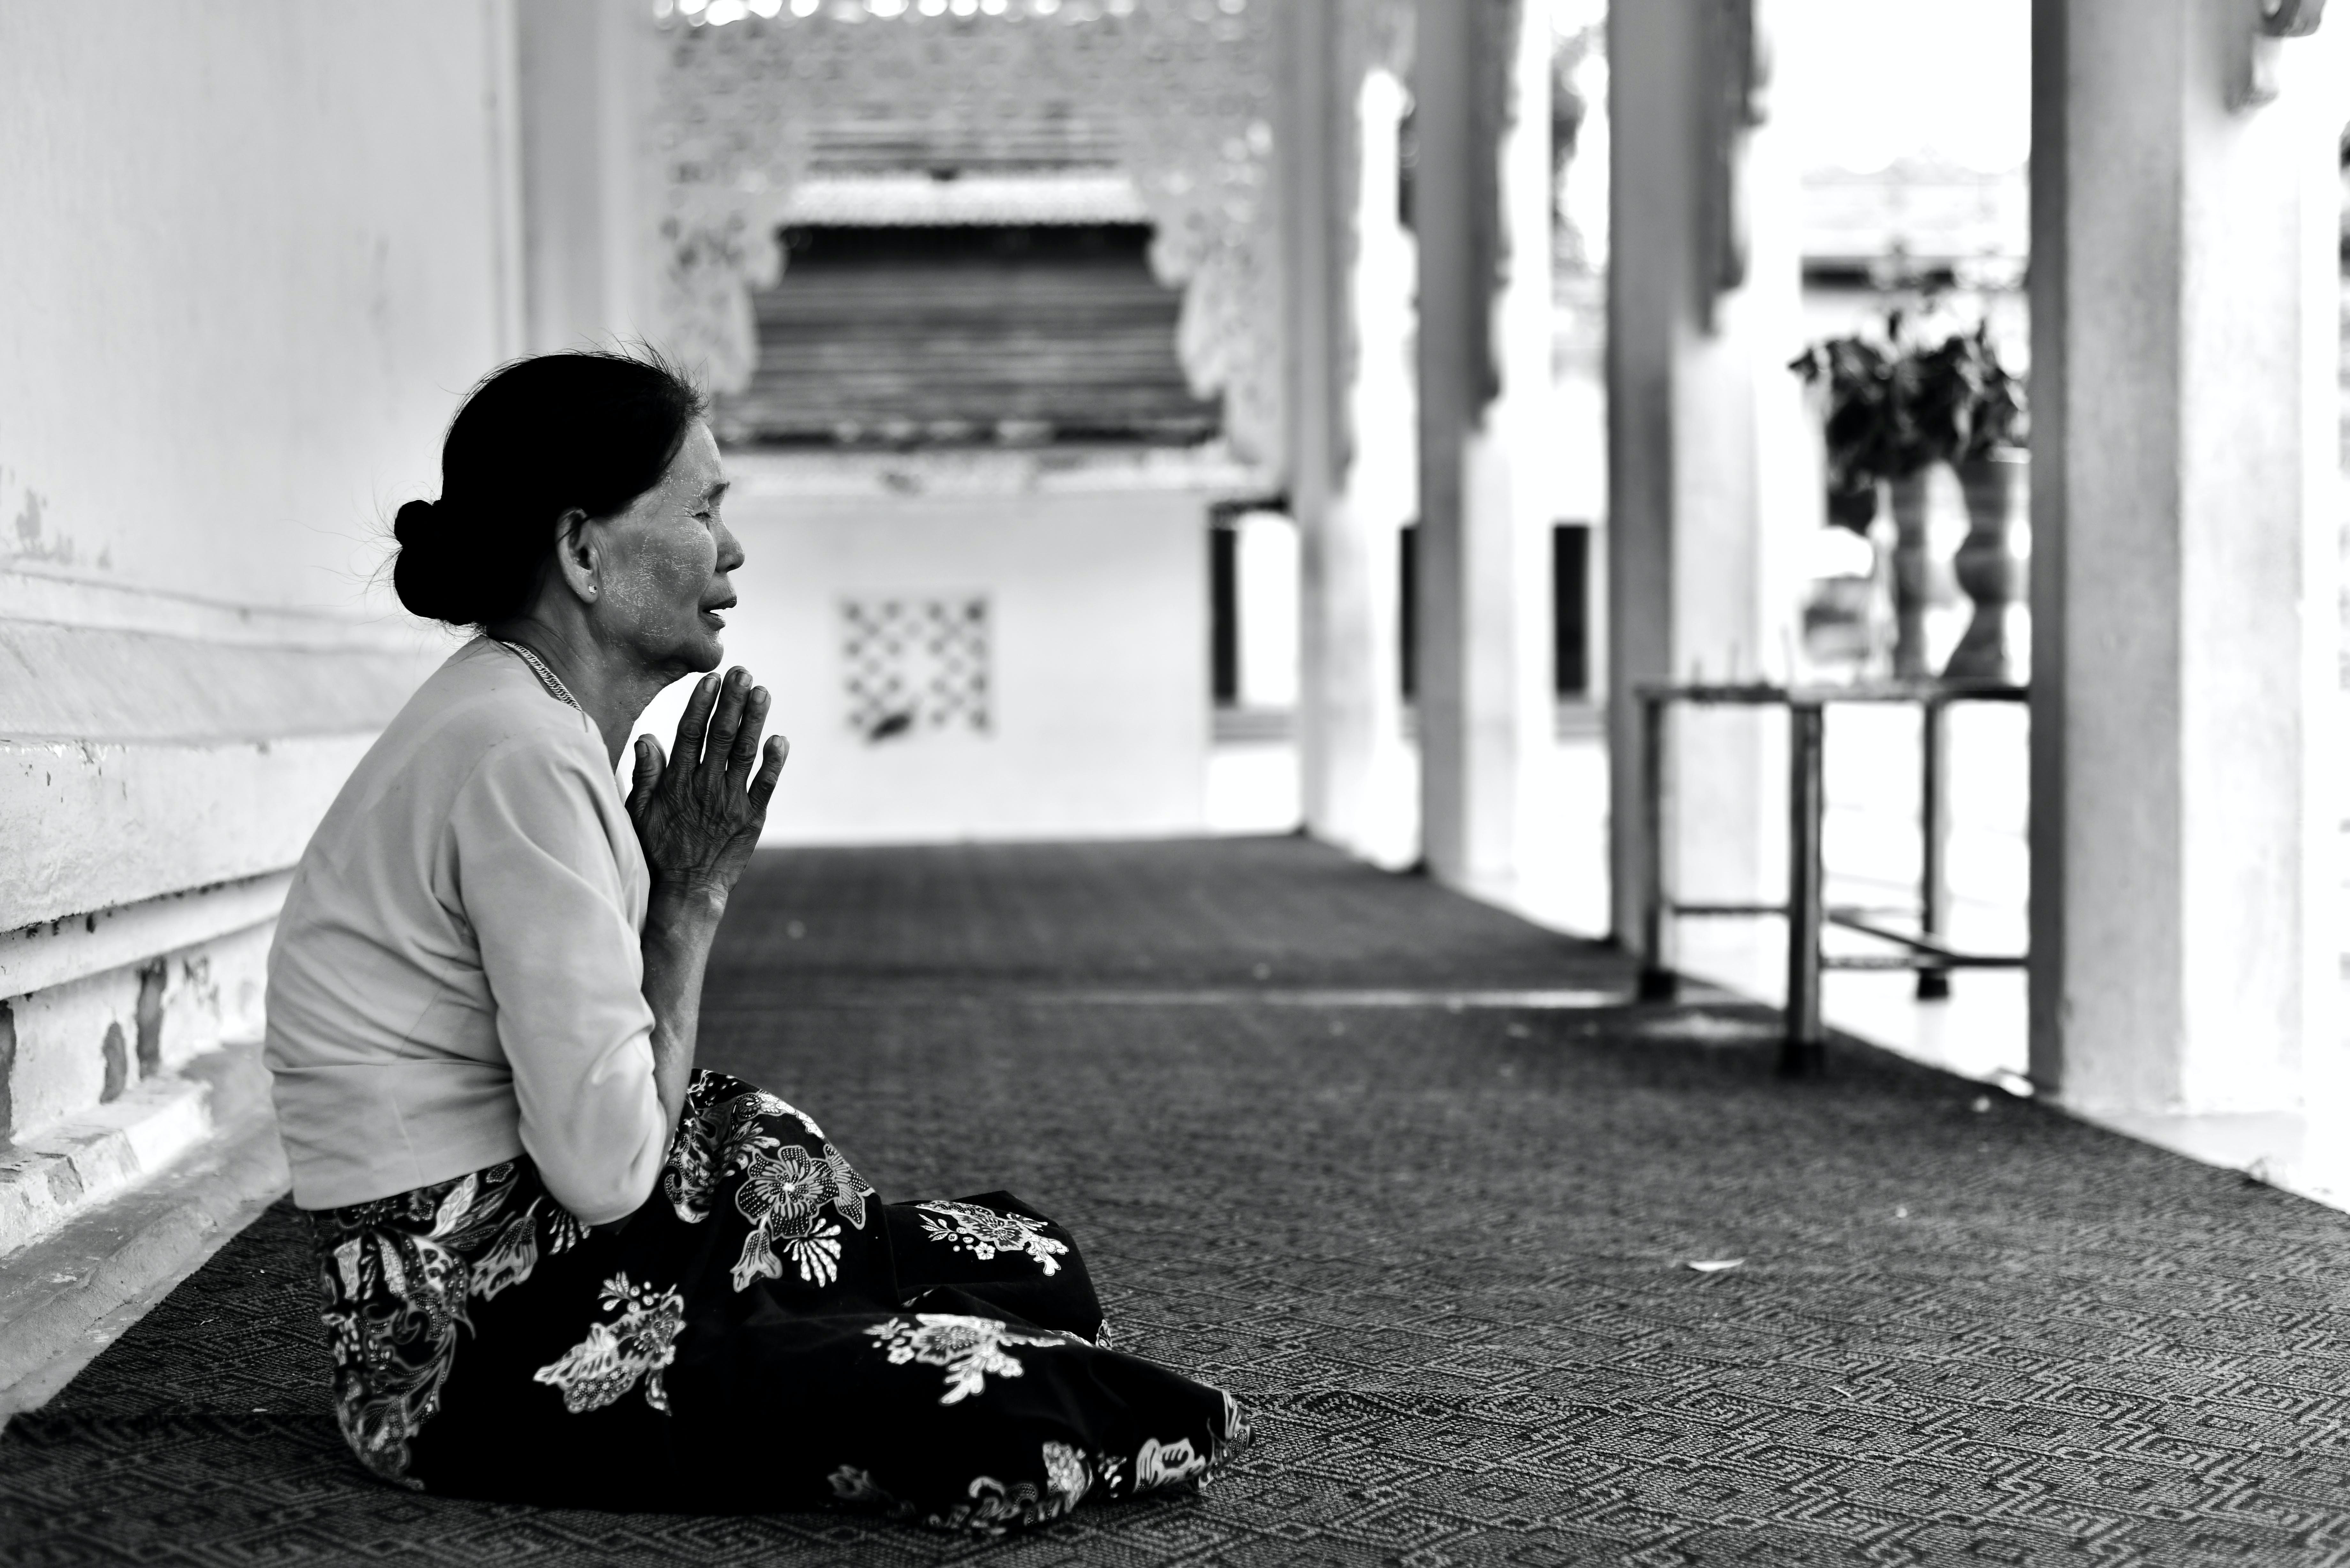 woman praying in grayscale photo